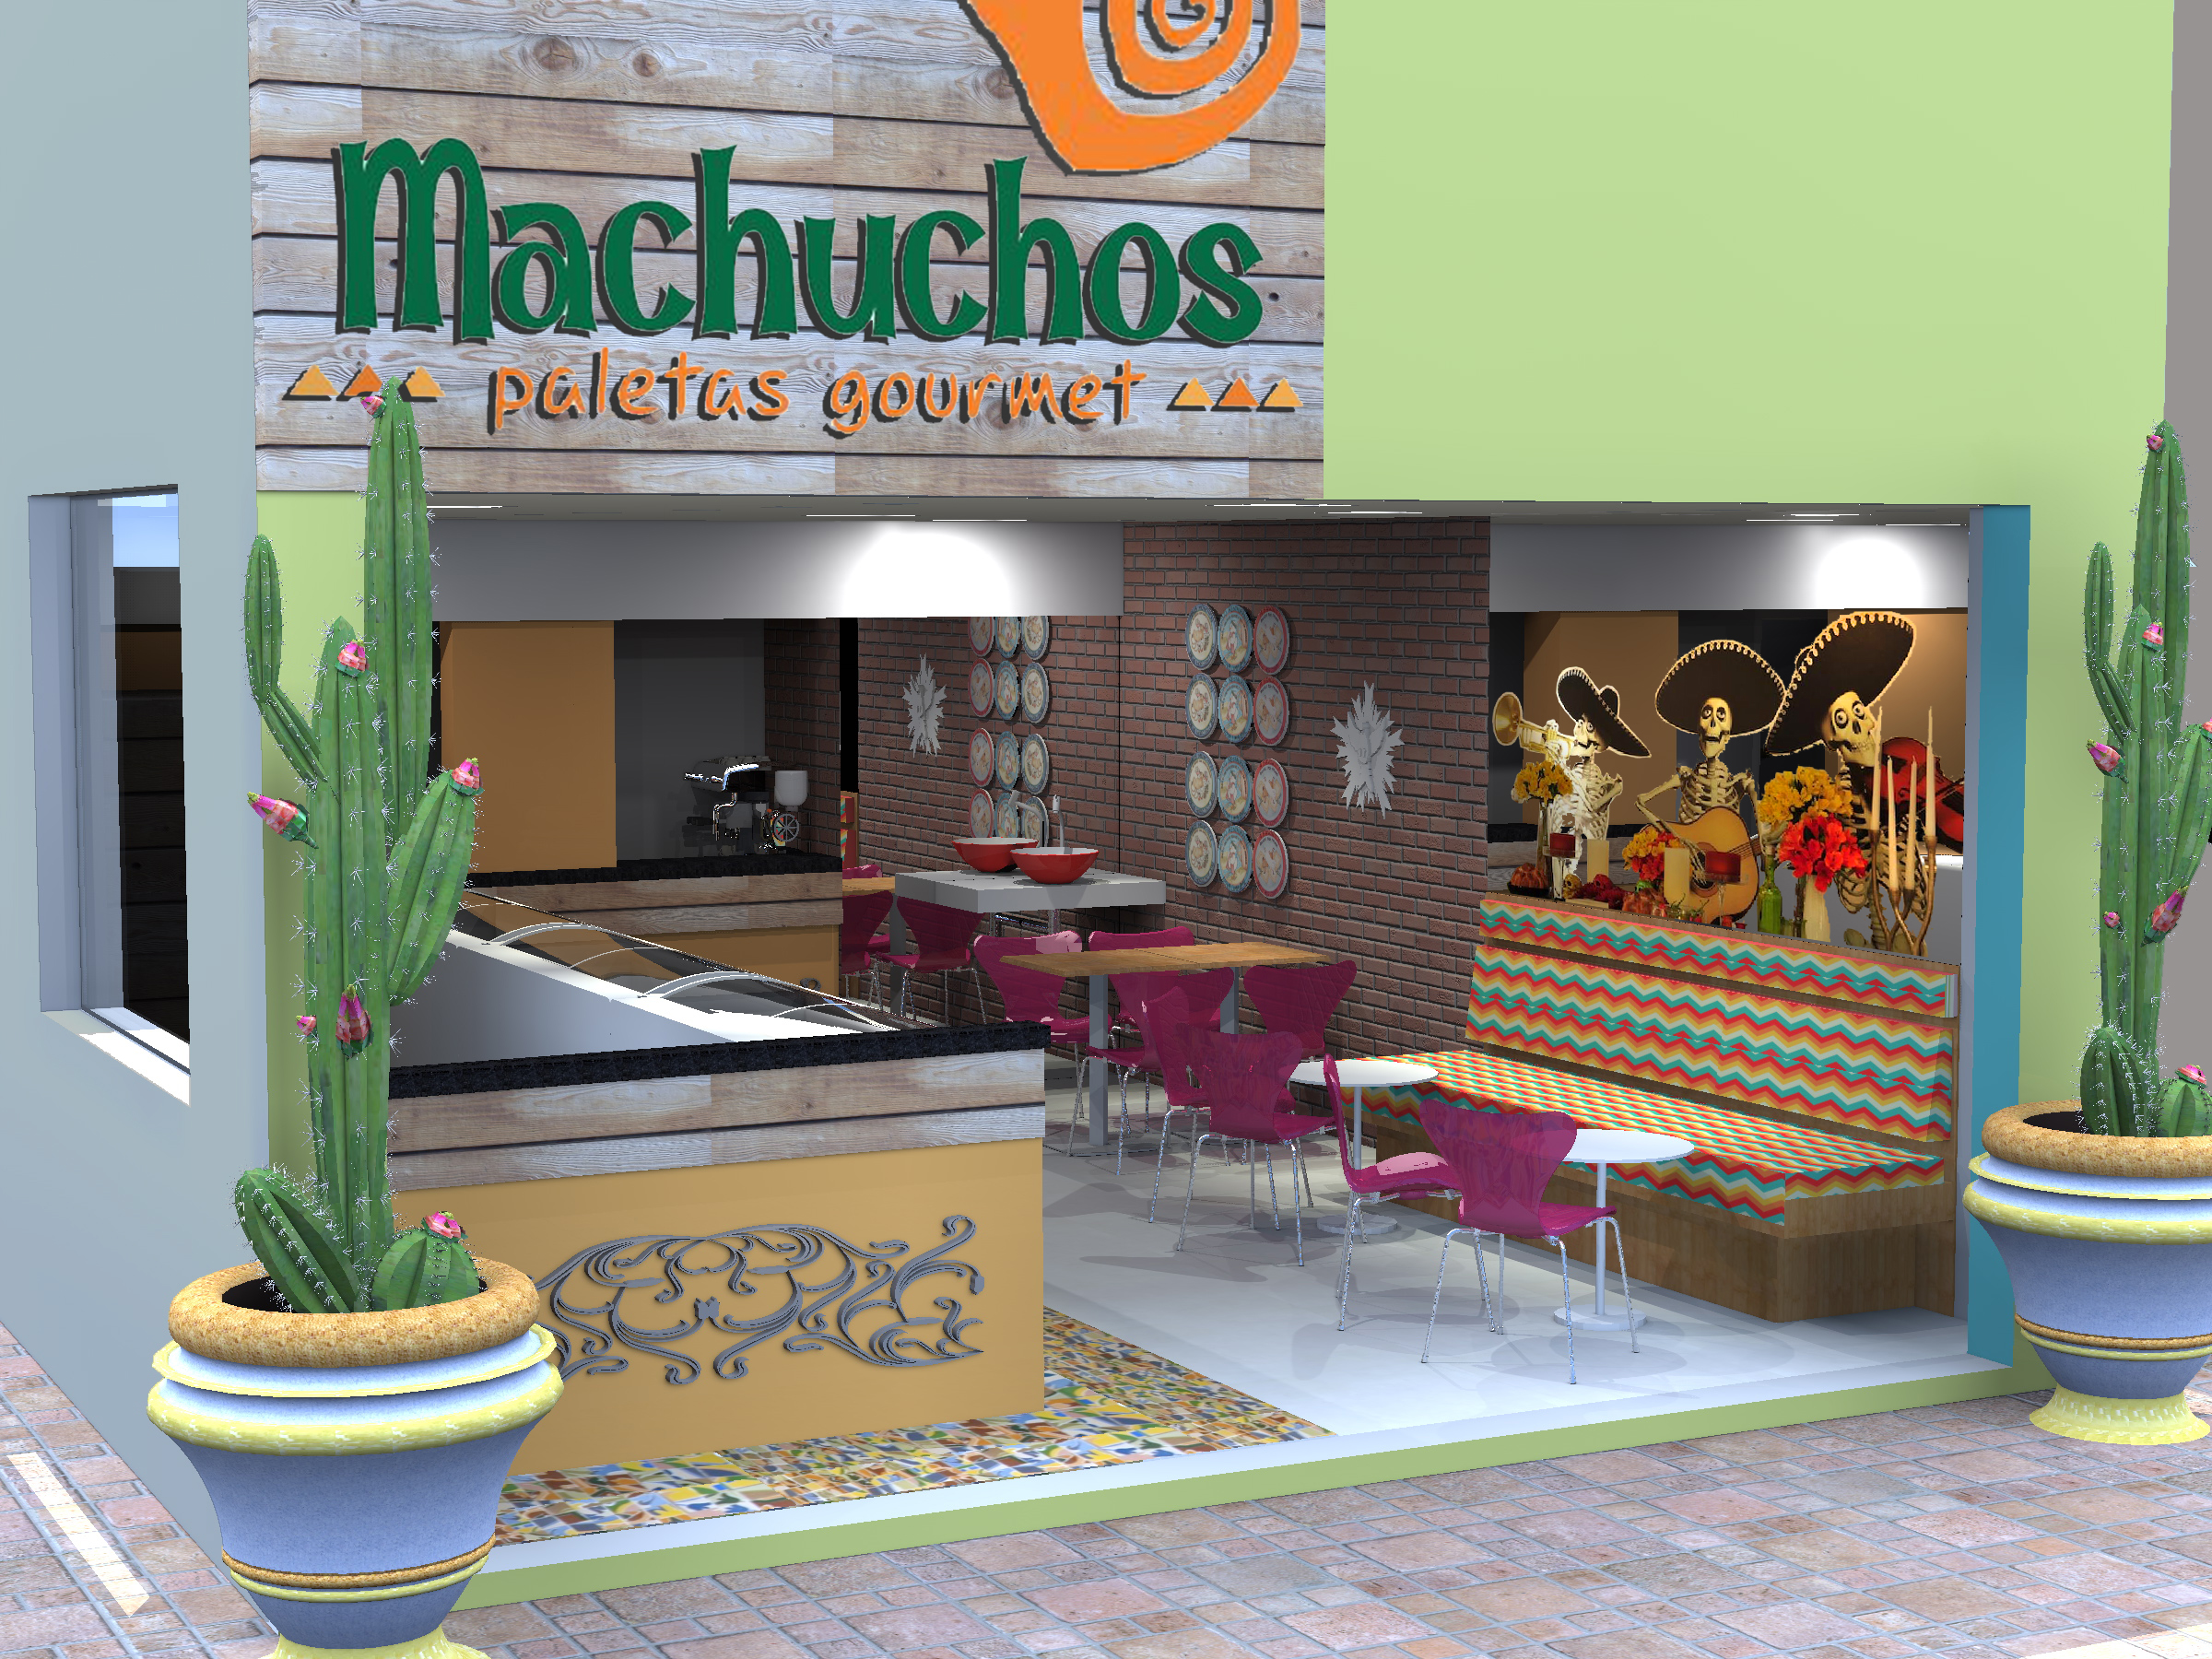 Machuchos - Paletas Gourmet